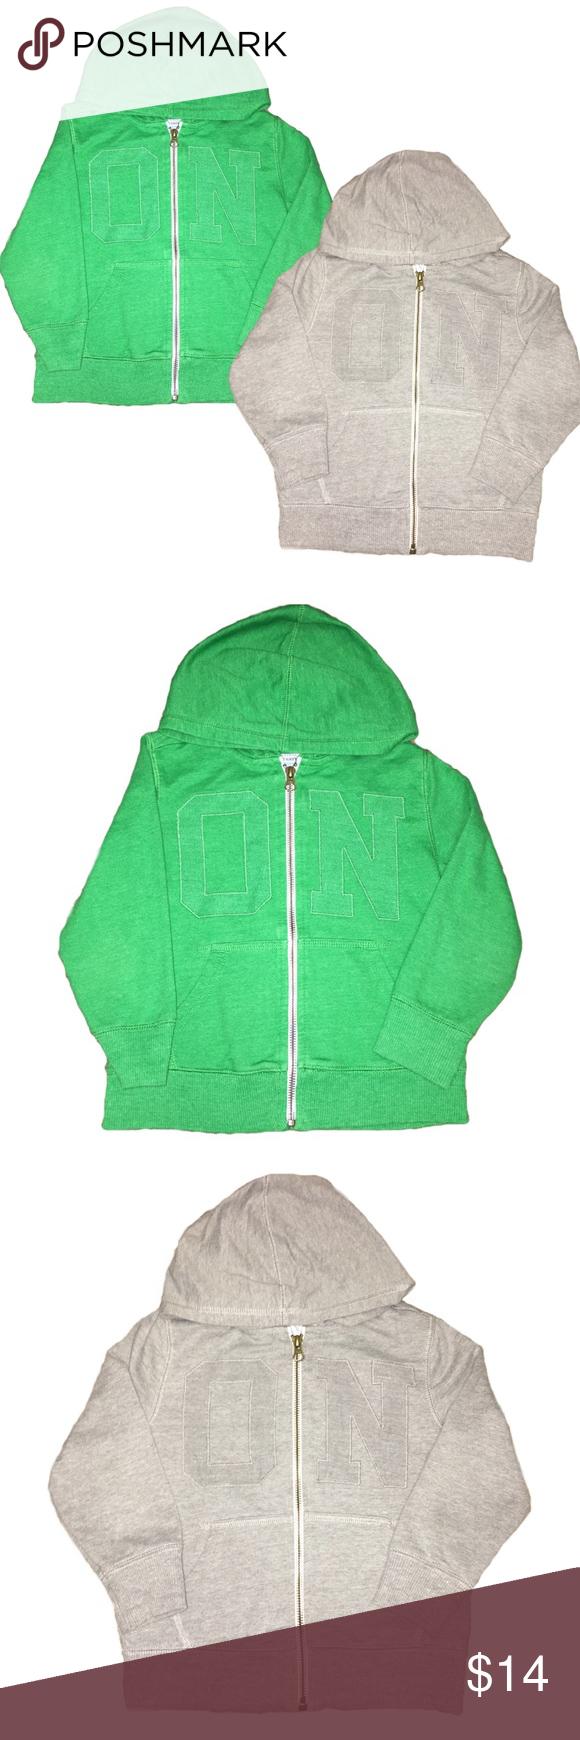 Old Navy zip up hoodies (2) Zip up hoodie bundle. Lightly worn with love. Pet and smoke free home Old Navy Shirts & Tops Sweatshirts & Hoodies